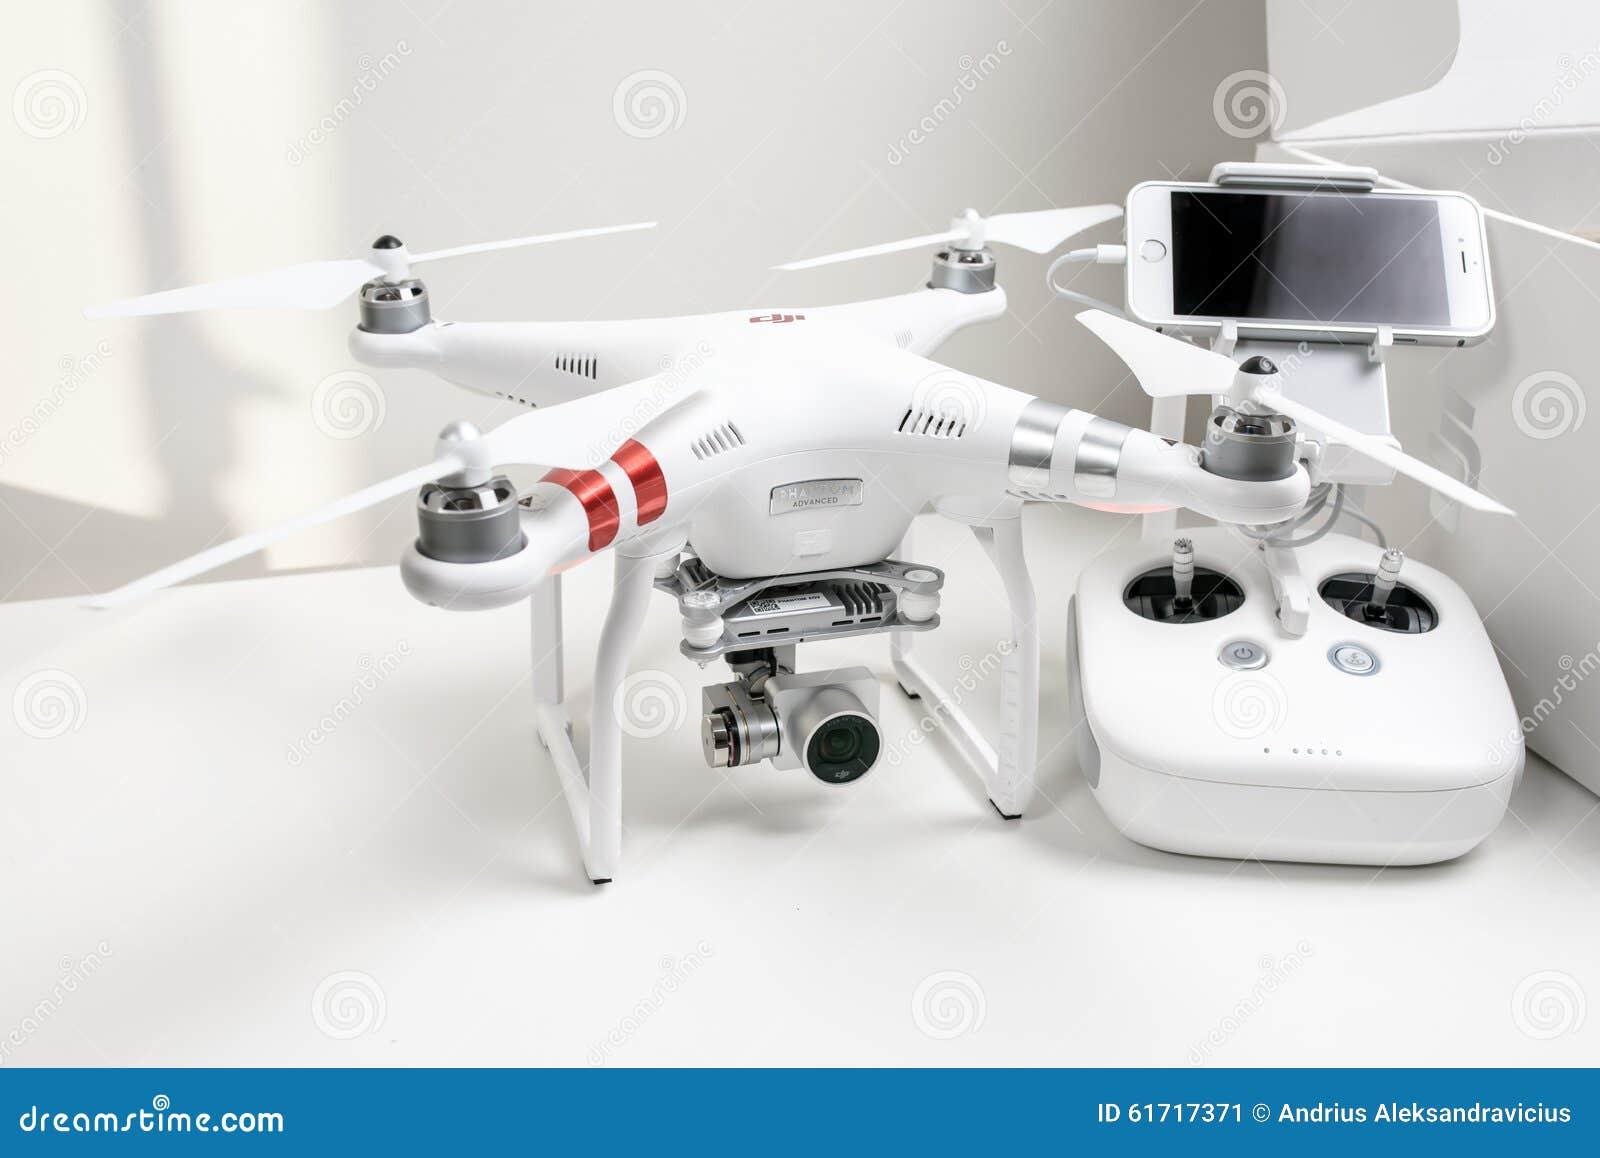 Drone Quadrocopter Dji Phantom 3 Advanced Editorial Photo